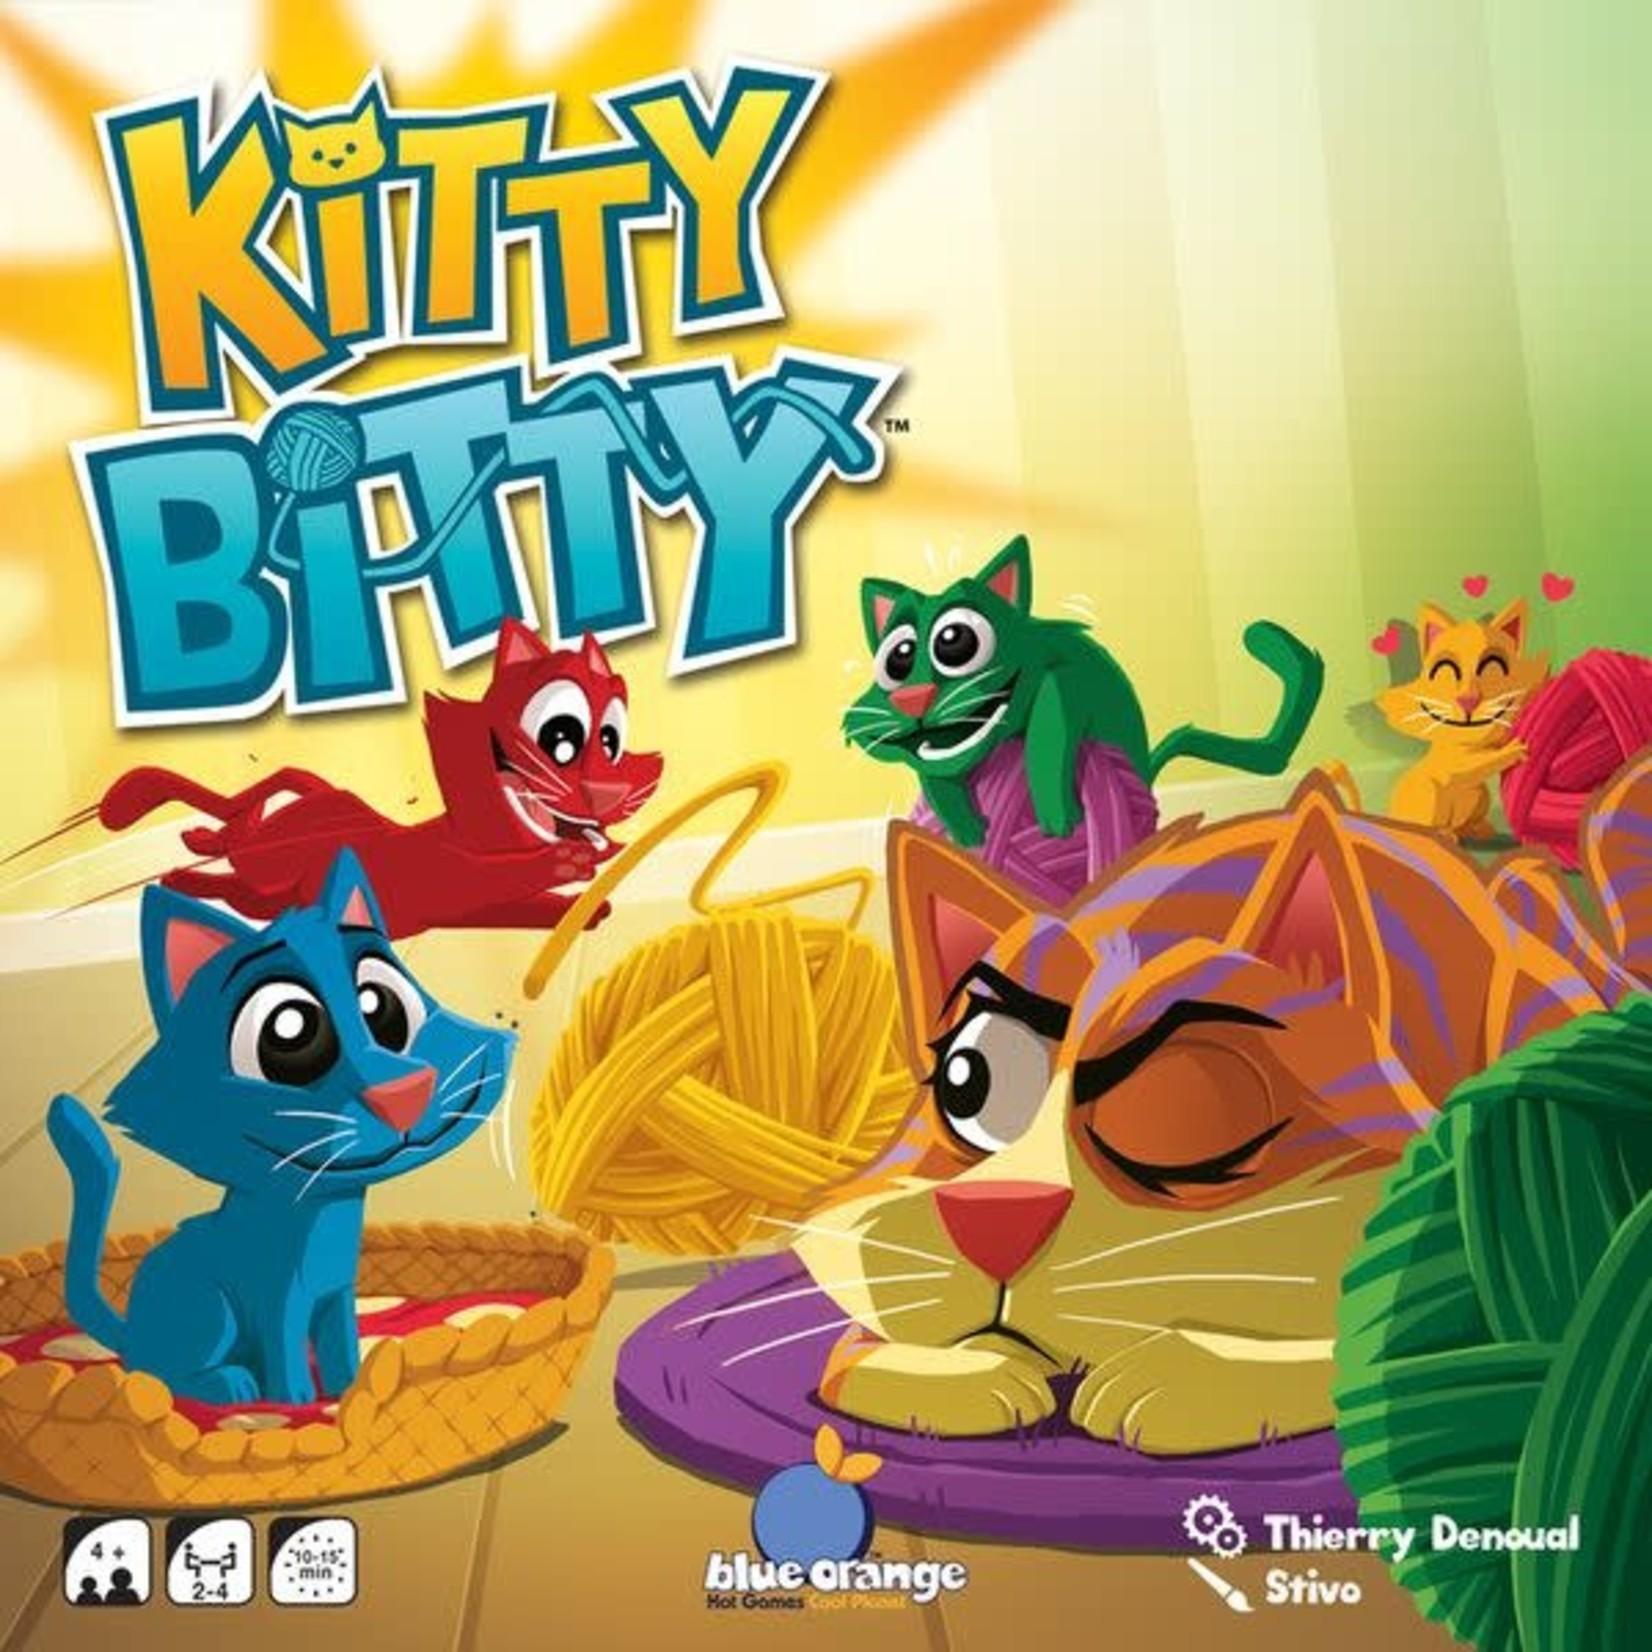 Blue Orange Games Kitty Bitty